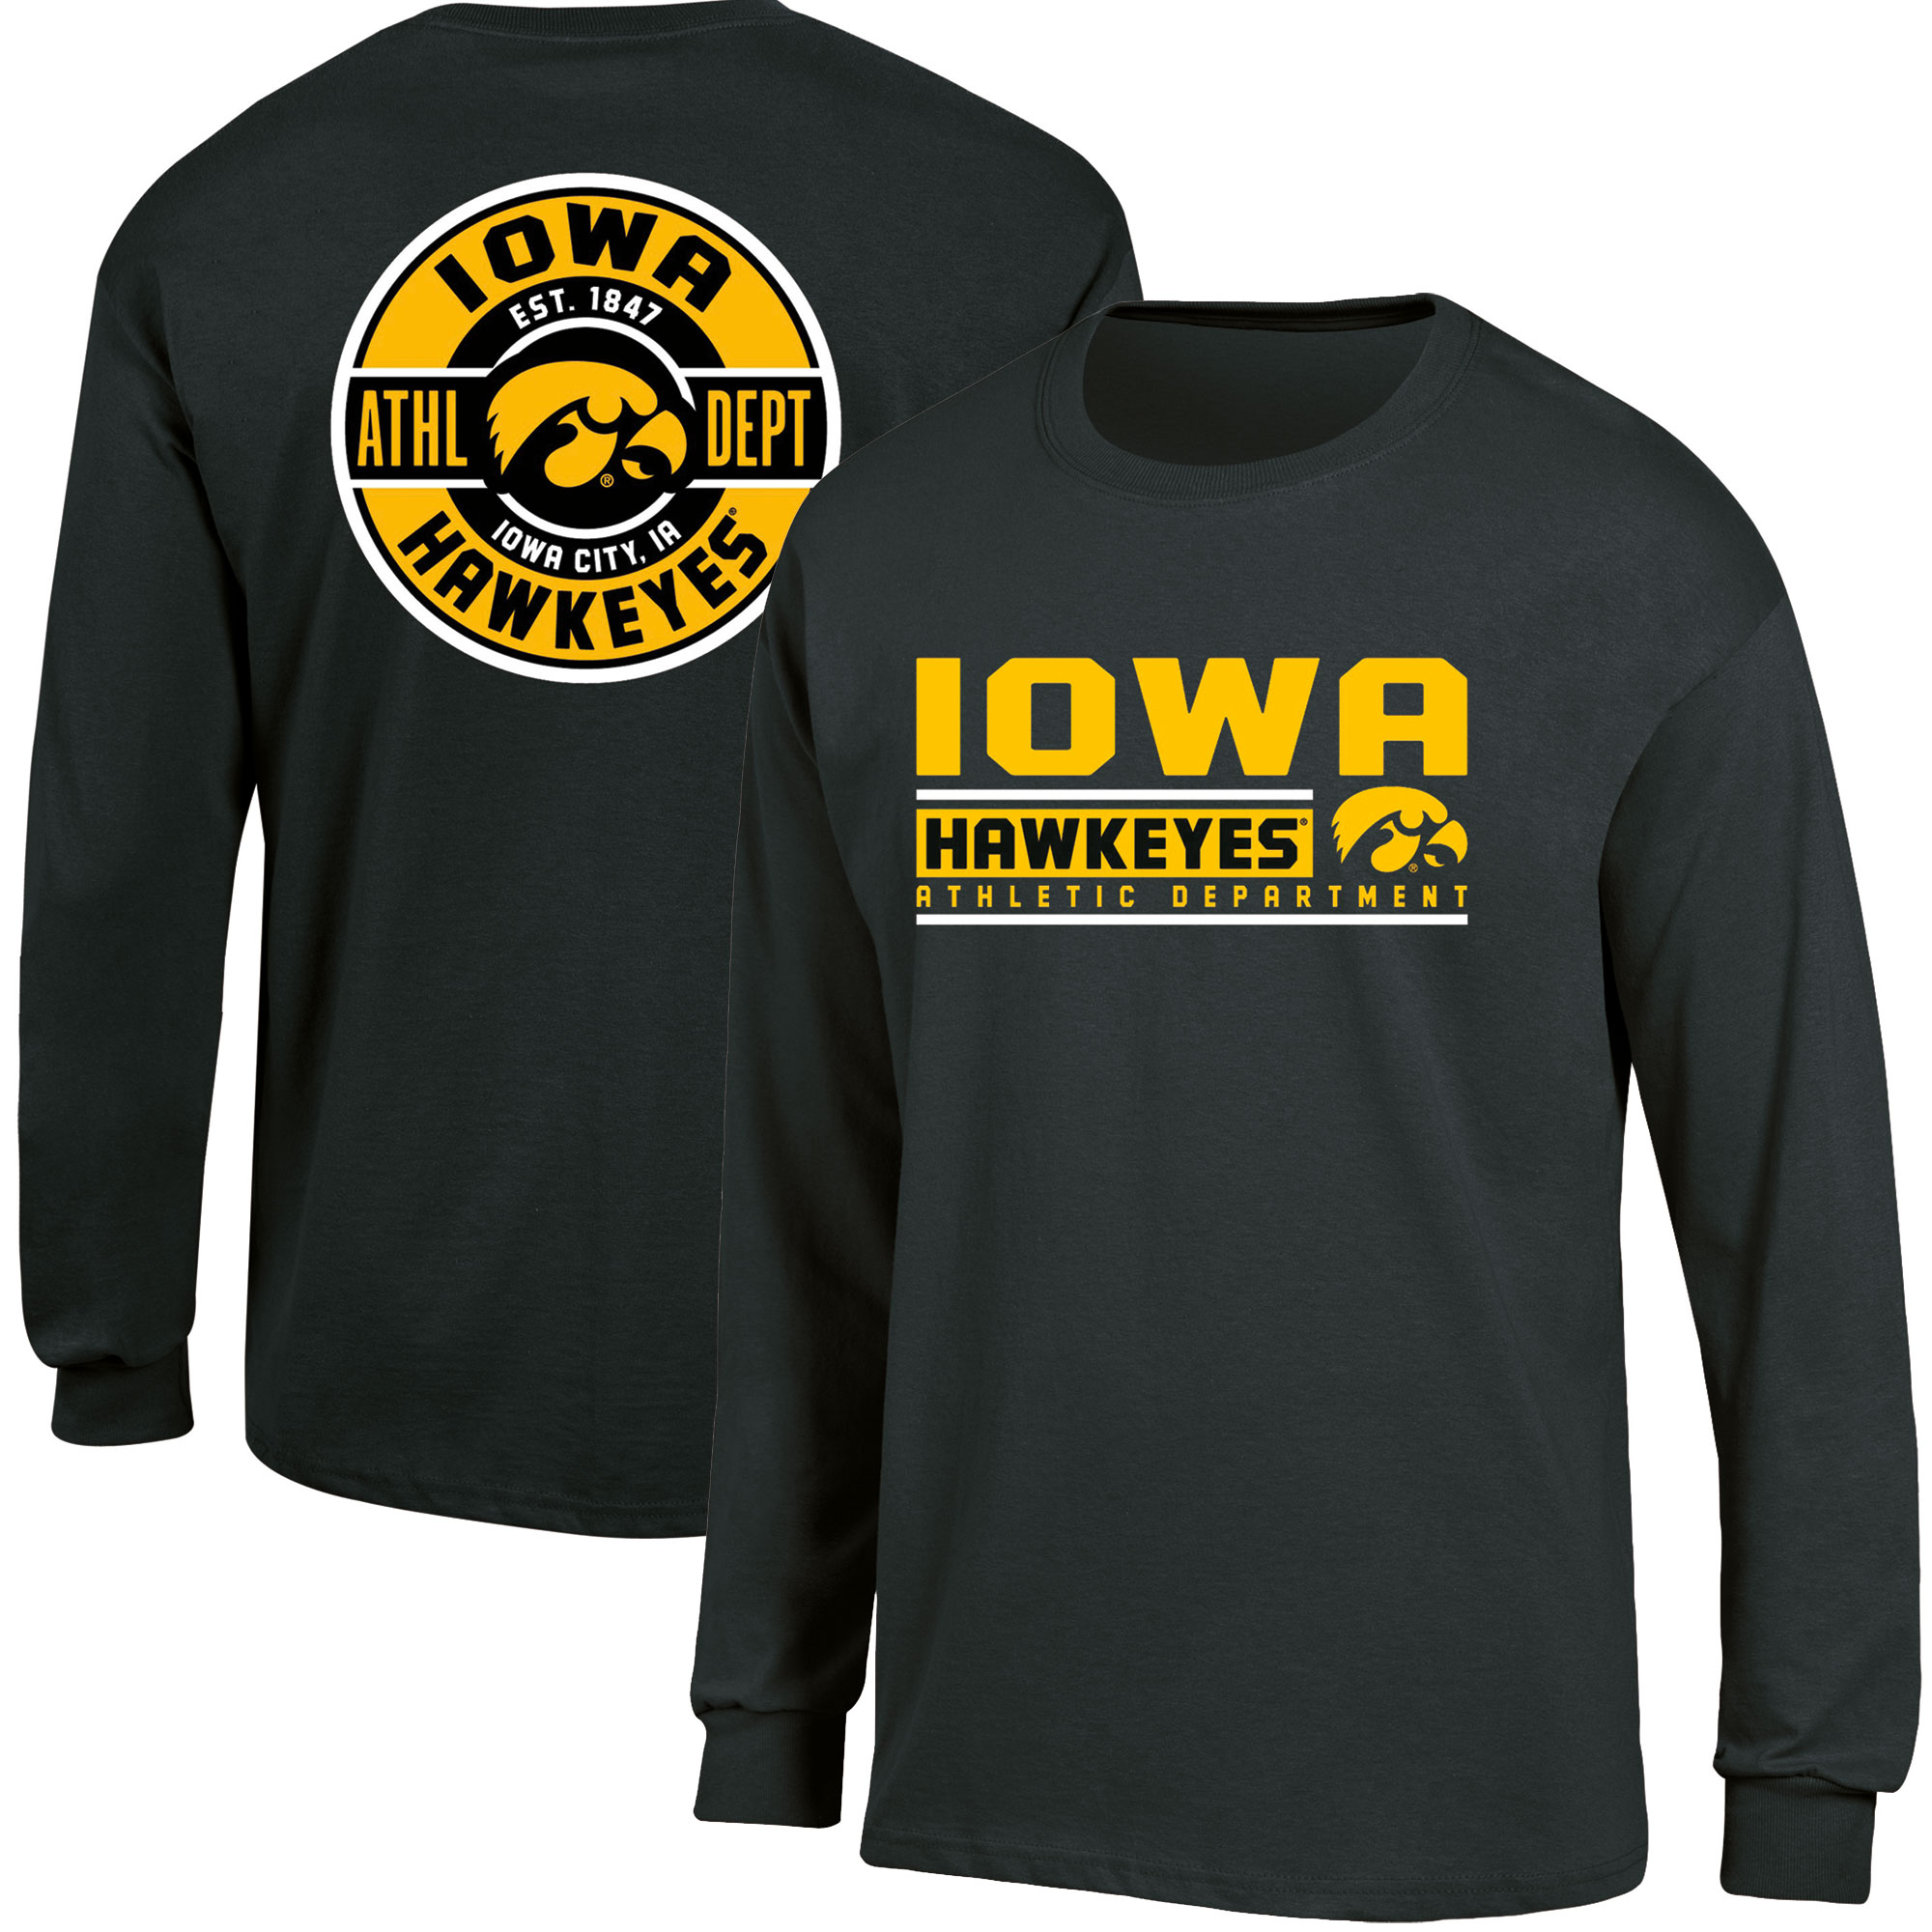 Men's Russell Black Iowa Hawkeyes Back Hit Long Sleeve T-Shirt